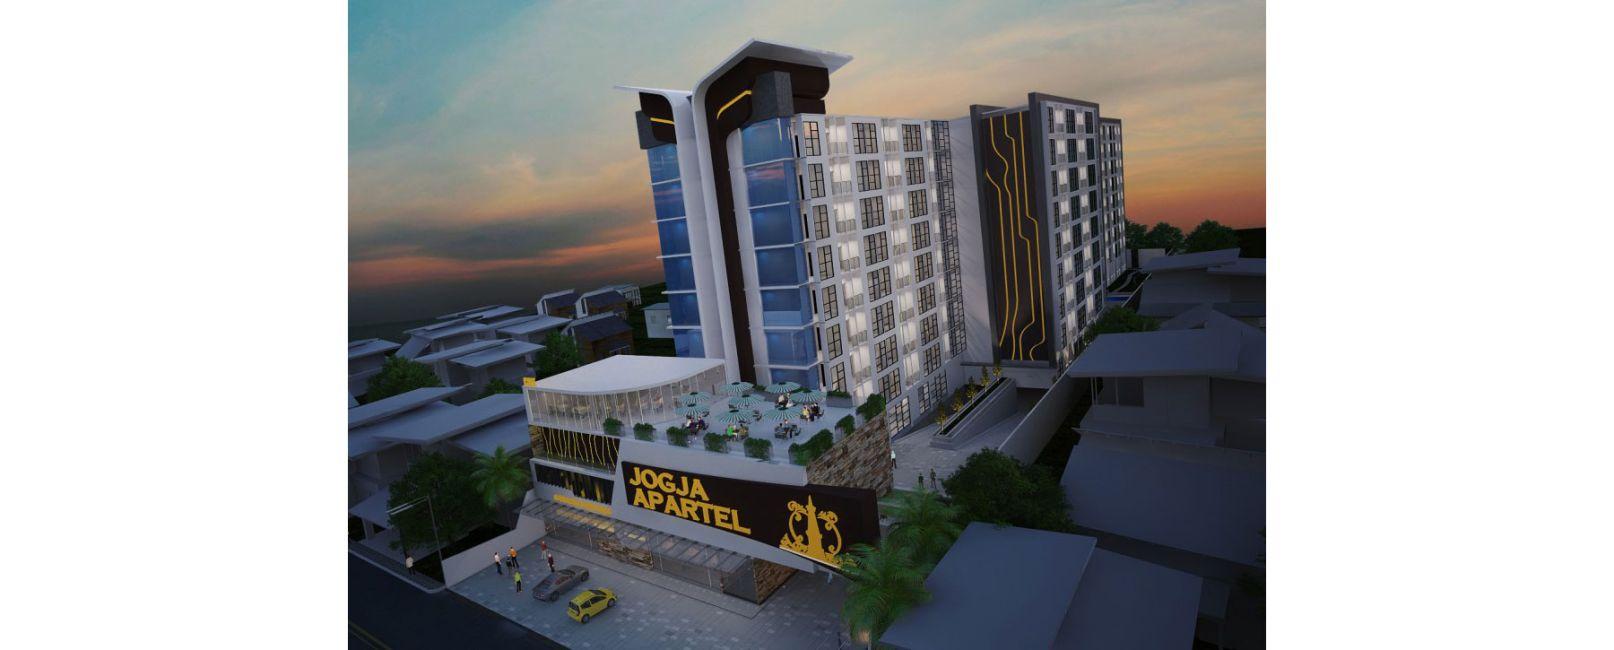 Residensial Jogja Apartel Tipe 3BR di Yogyakarta